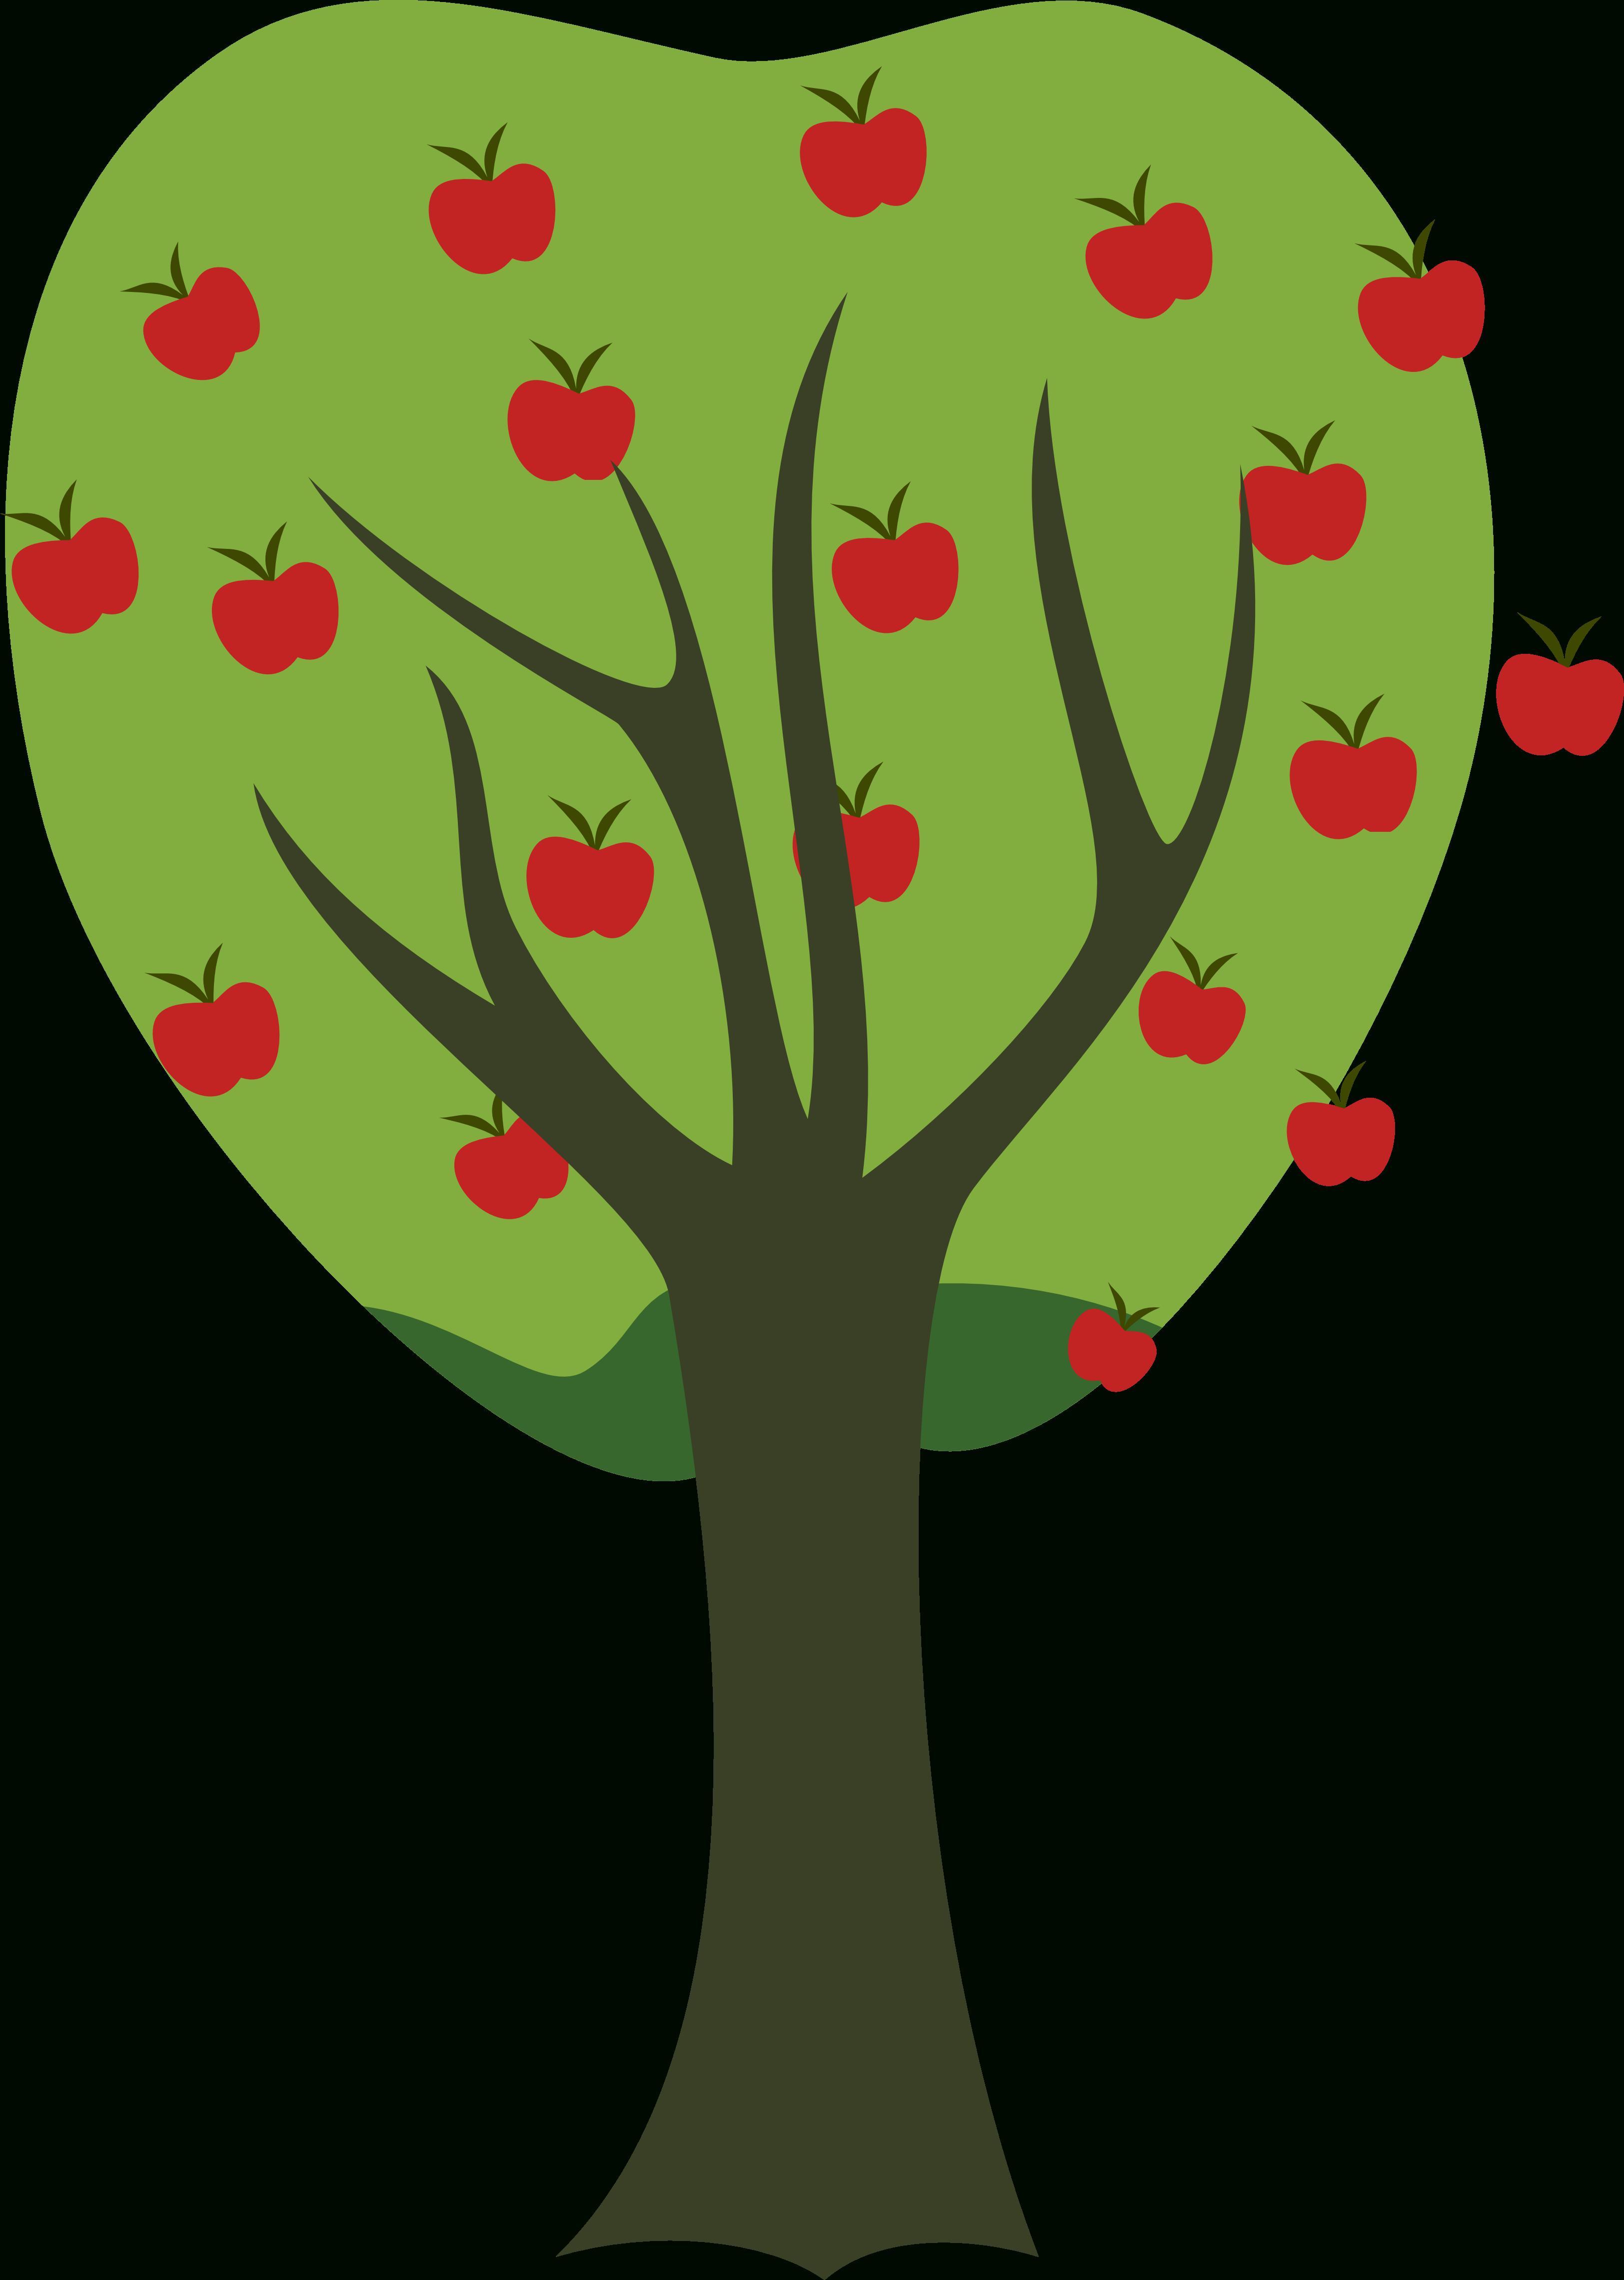 Clipart trees fruit. Apple tree transparent letters